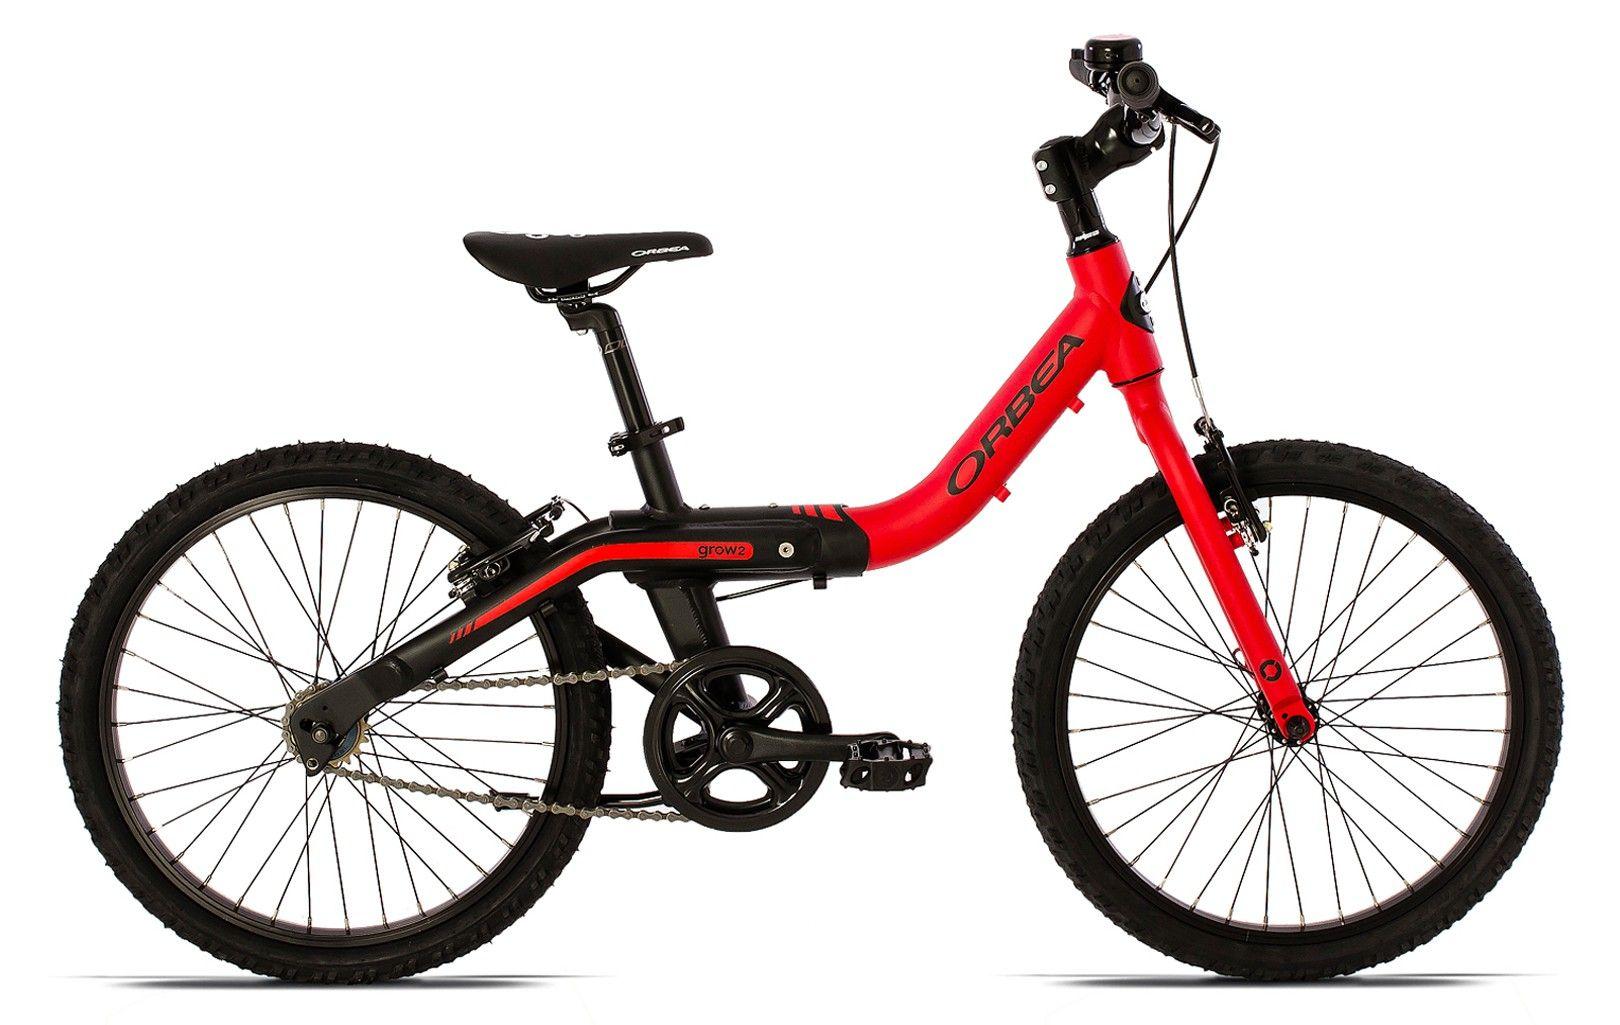 8b43bdb58af3b Kids Bike - Orbea Grow 2 1v 2013 - Red Black £224.10 SALE